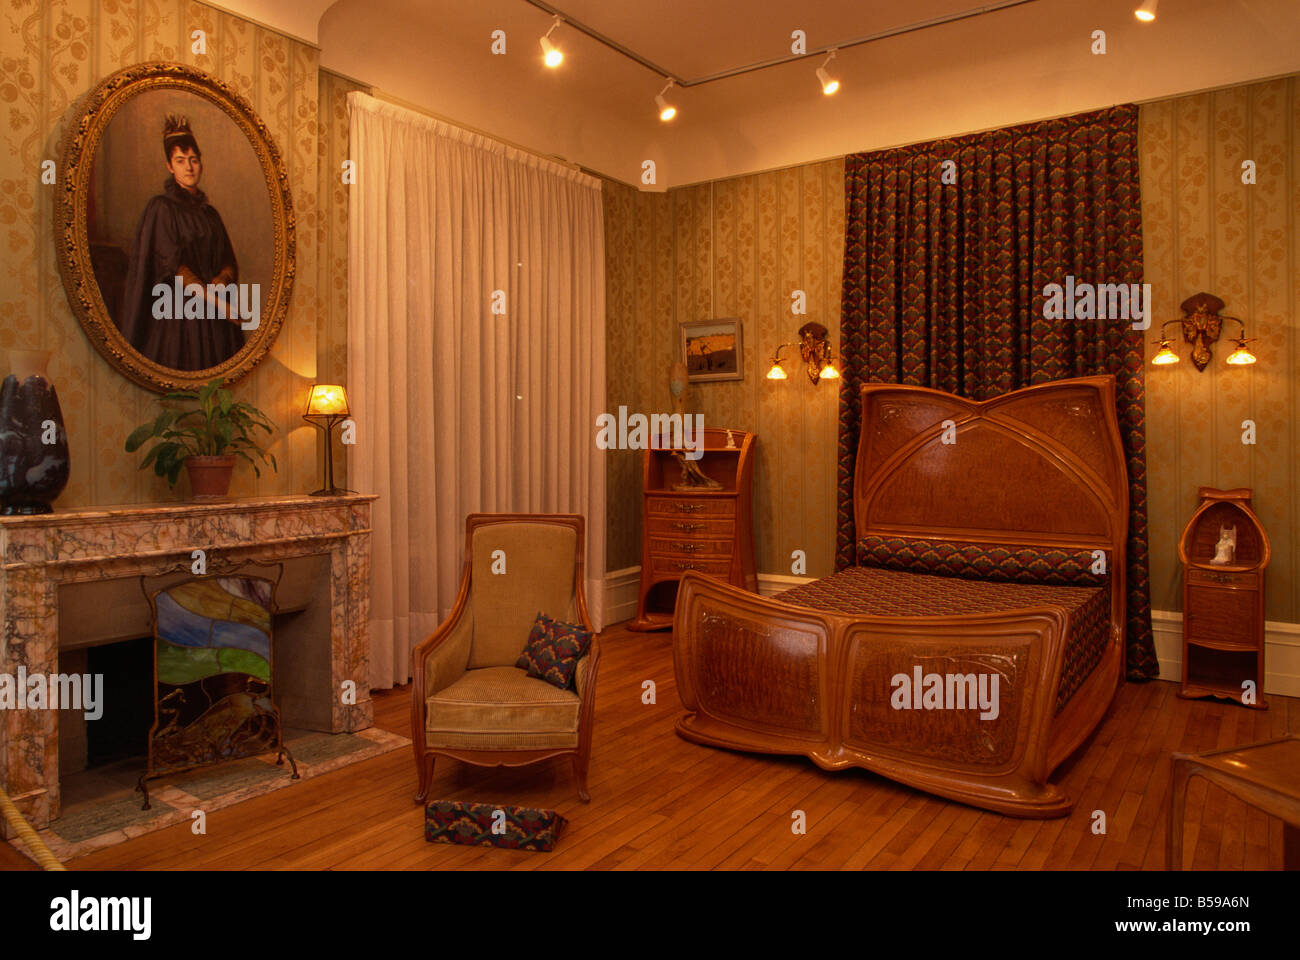 Jugendstil Schlafzimmer Innenraum im Musee de l \' Ecole de Nancy ...